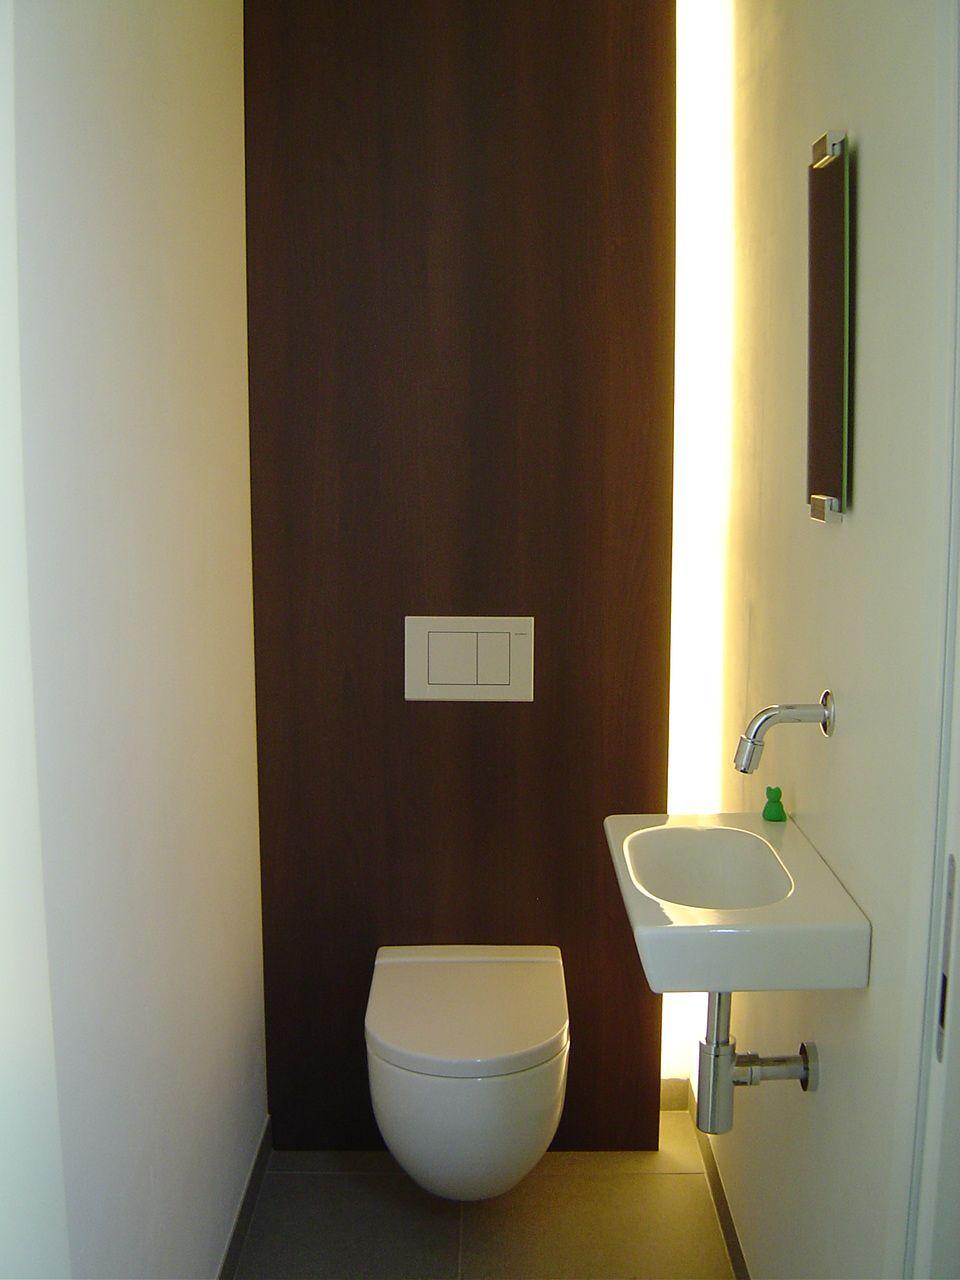 Toilet met verticale lichtstrip - Verlichting | Pinterest - Wc ...